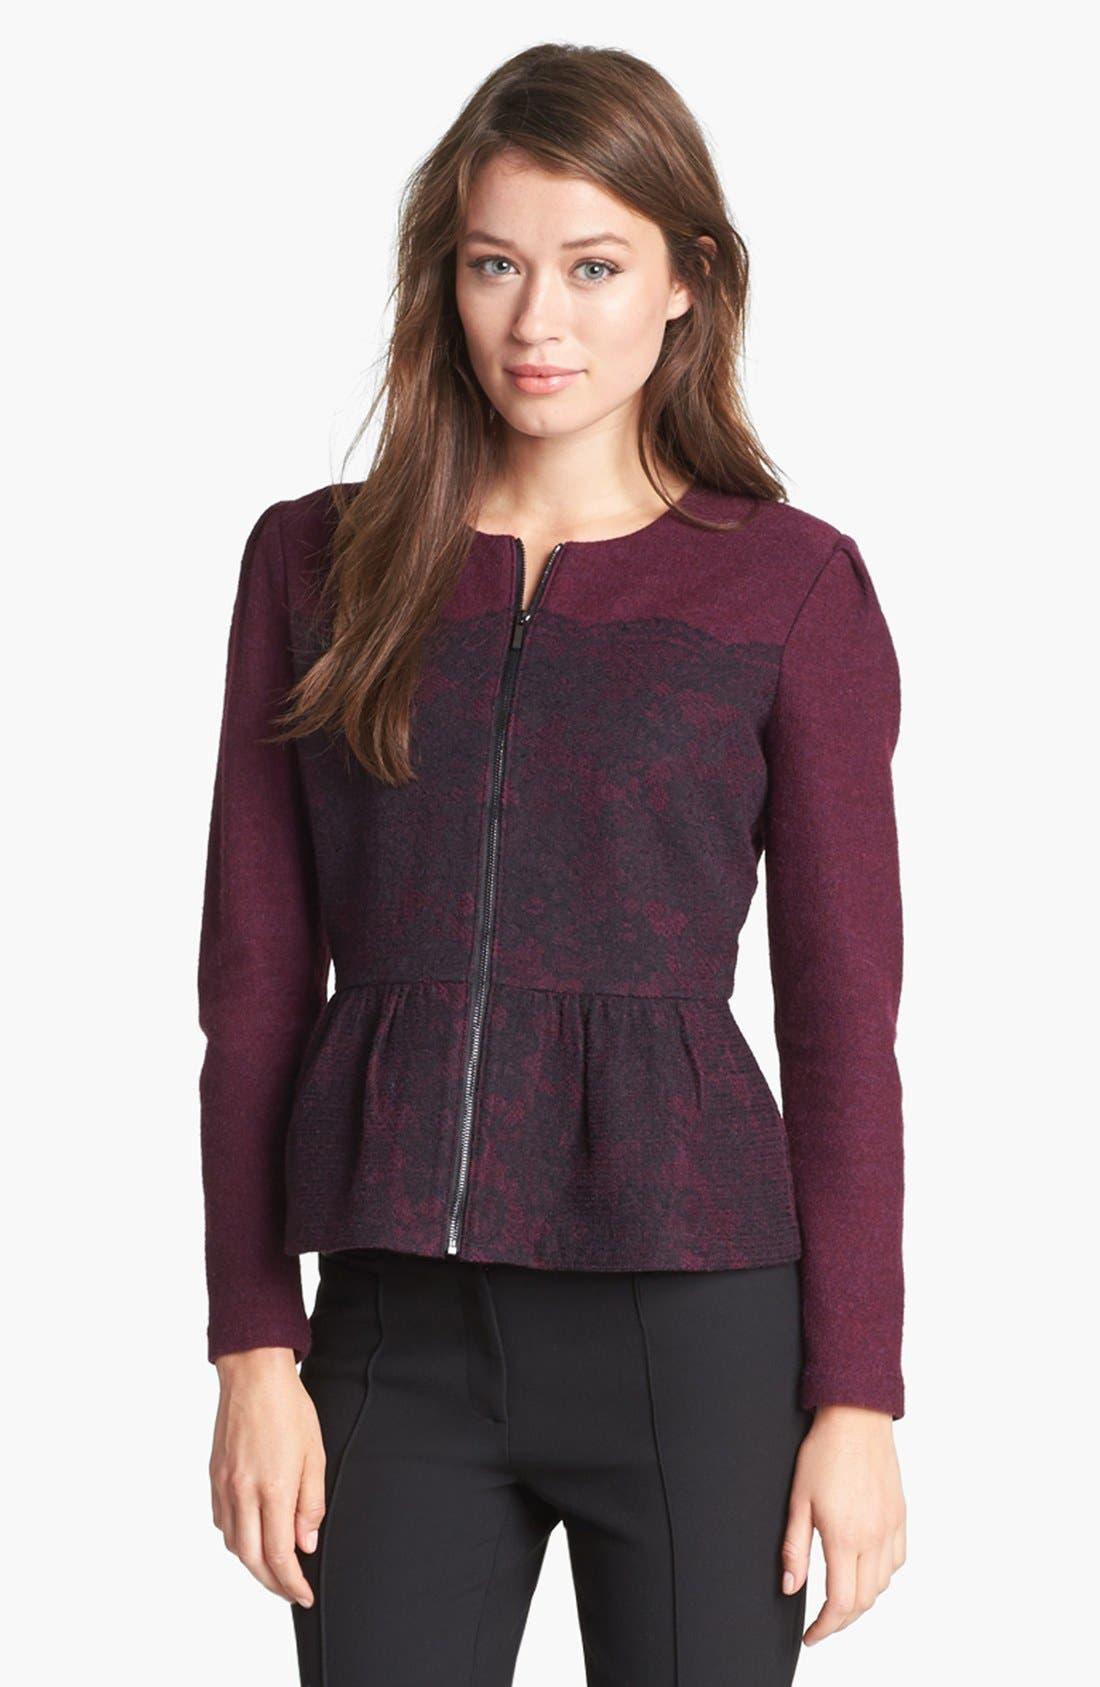 Alternate Image 1 Selected - Classiques Entier® Merino & Lace Zip Cardigan